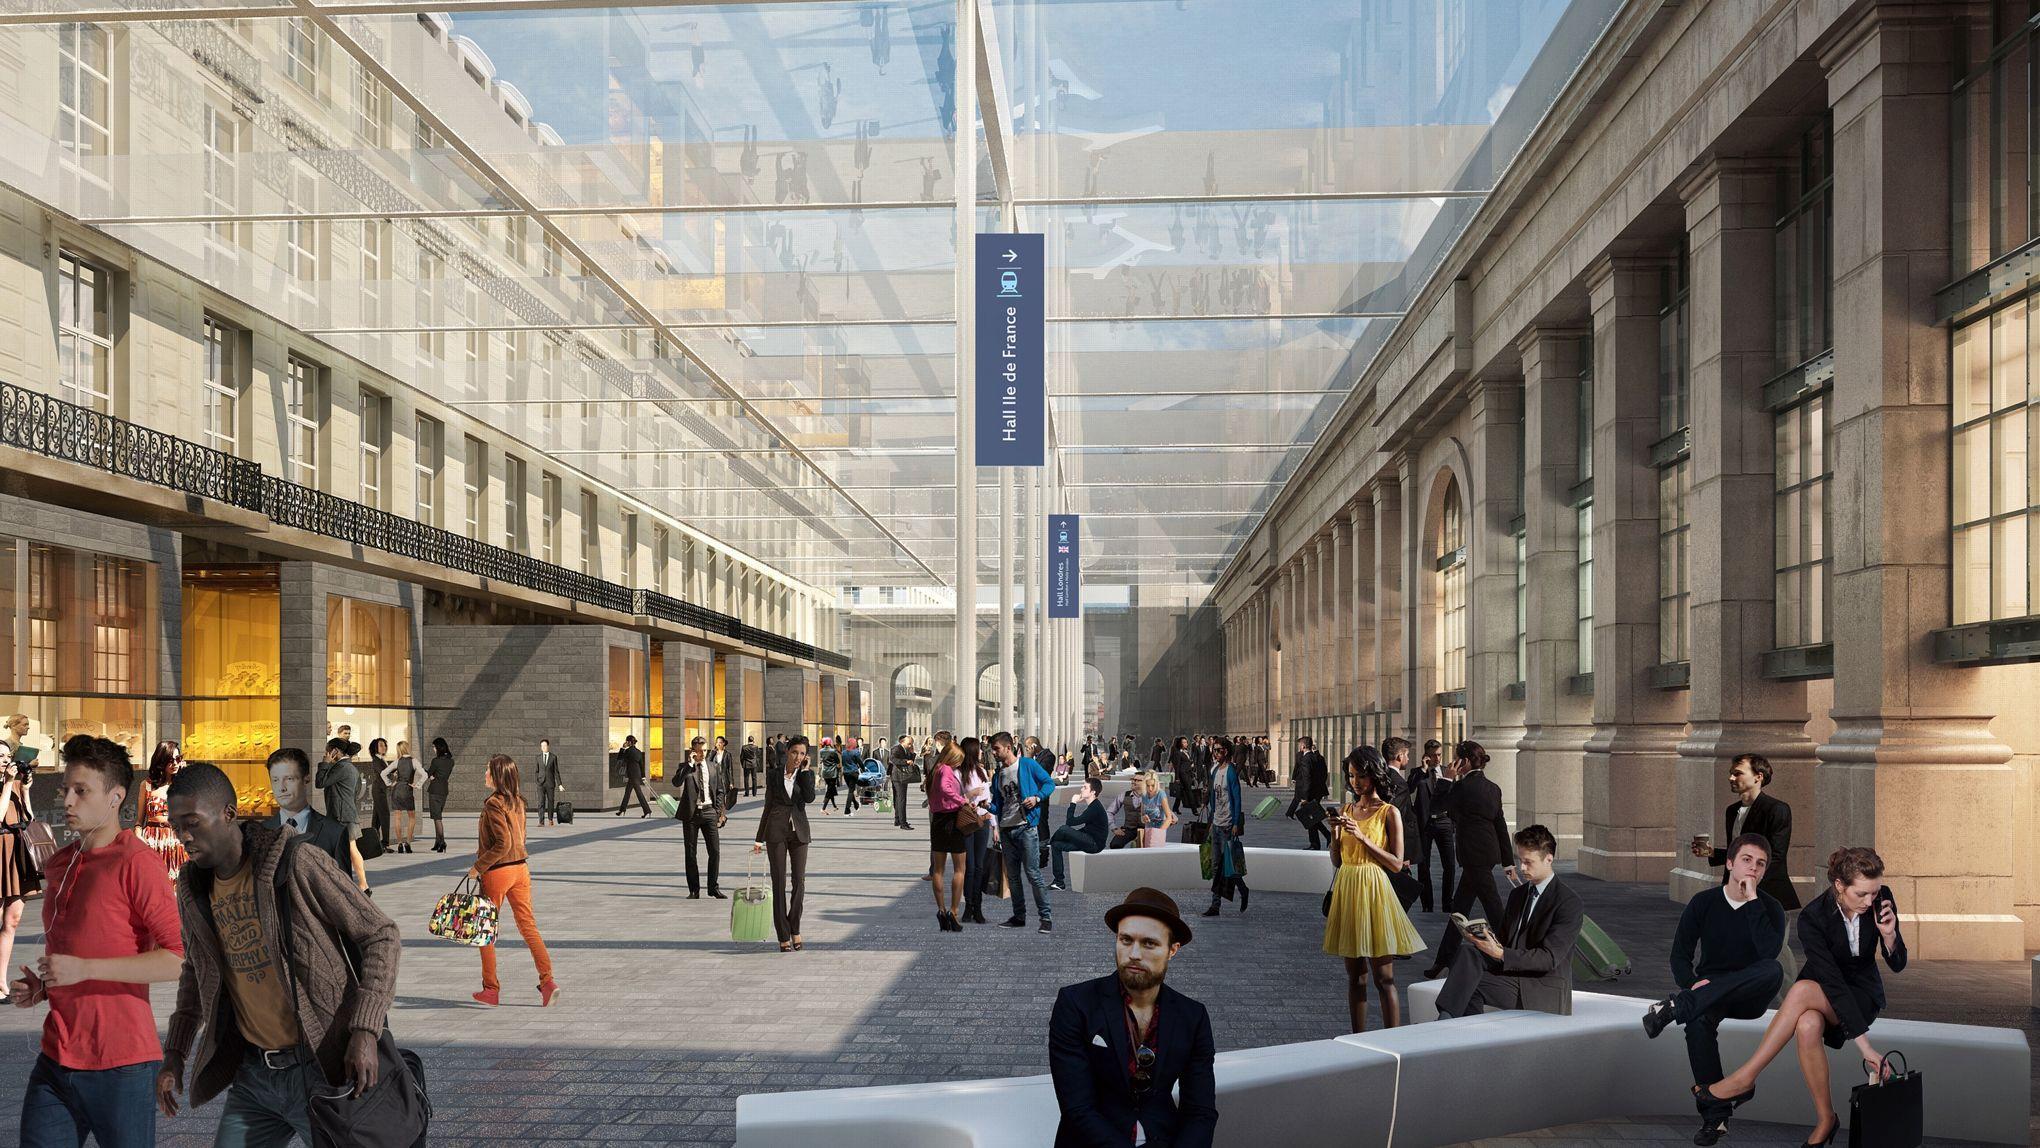 Jean michel wilmotte l 39 architecte qui redessine paris for Annuaire architecte paris